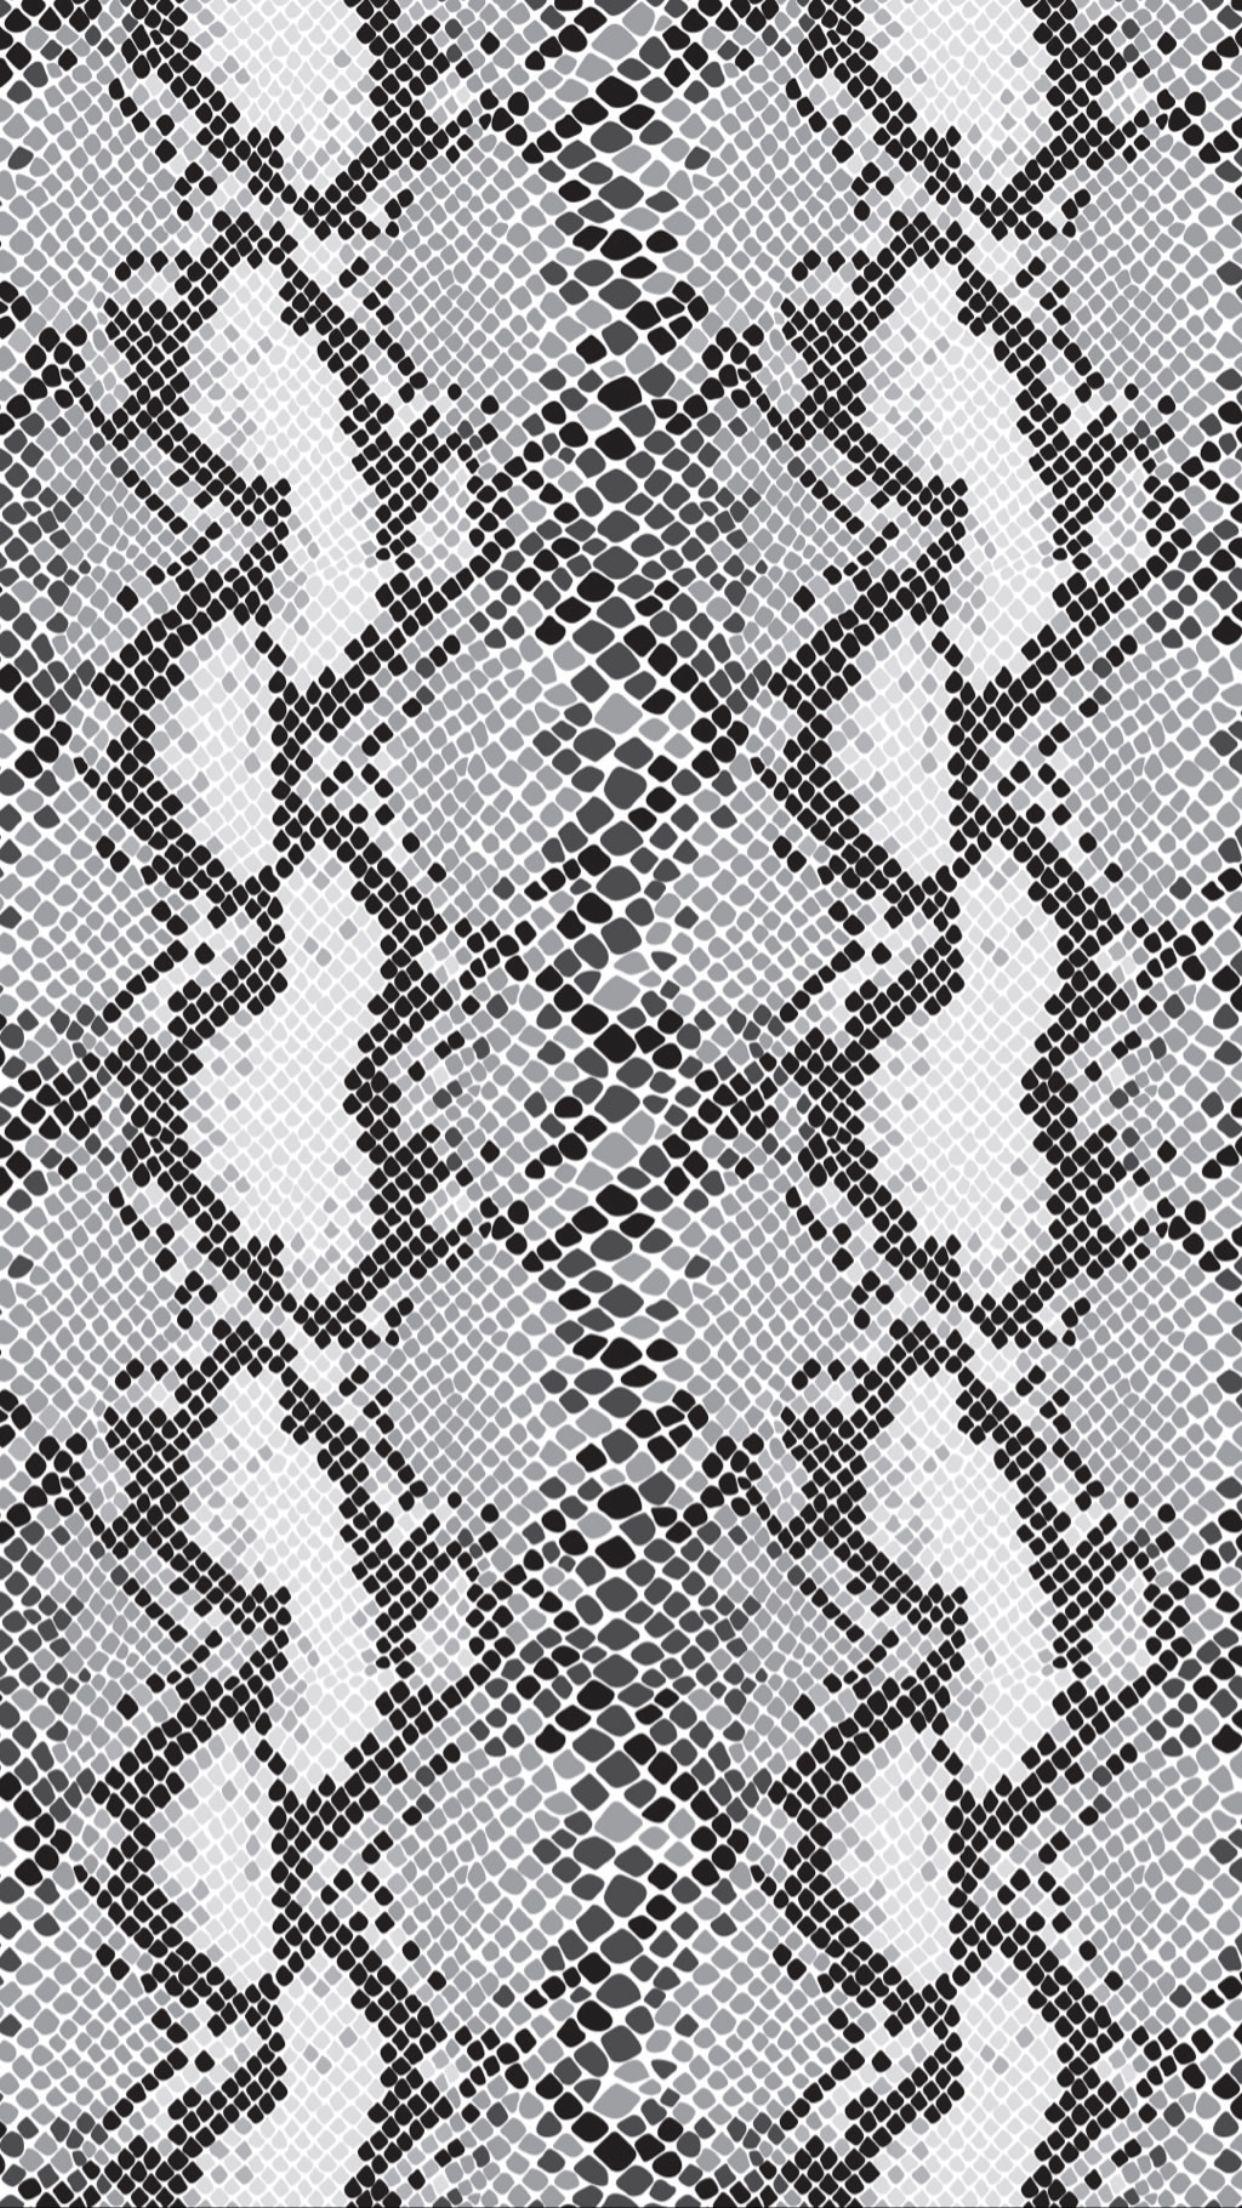 Background Iphone Animal Print Wallpaper Graphic Wall Art Iphone Wallpaper Vsco